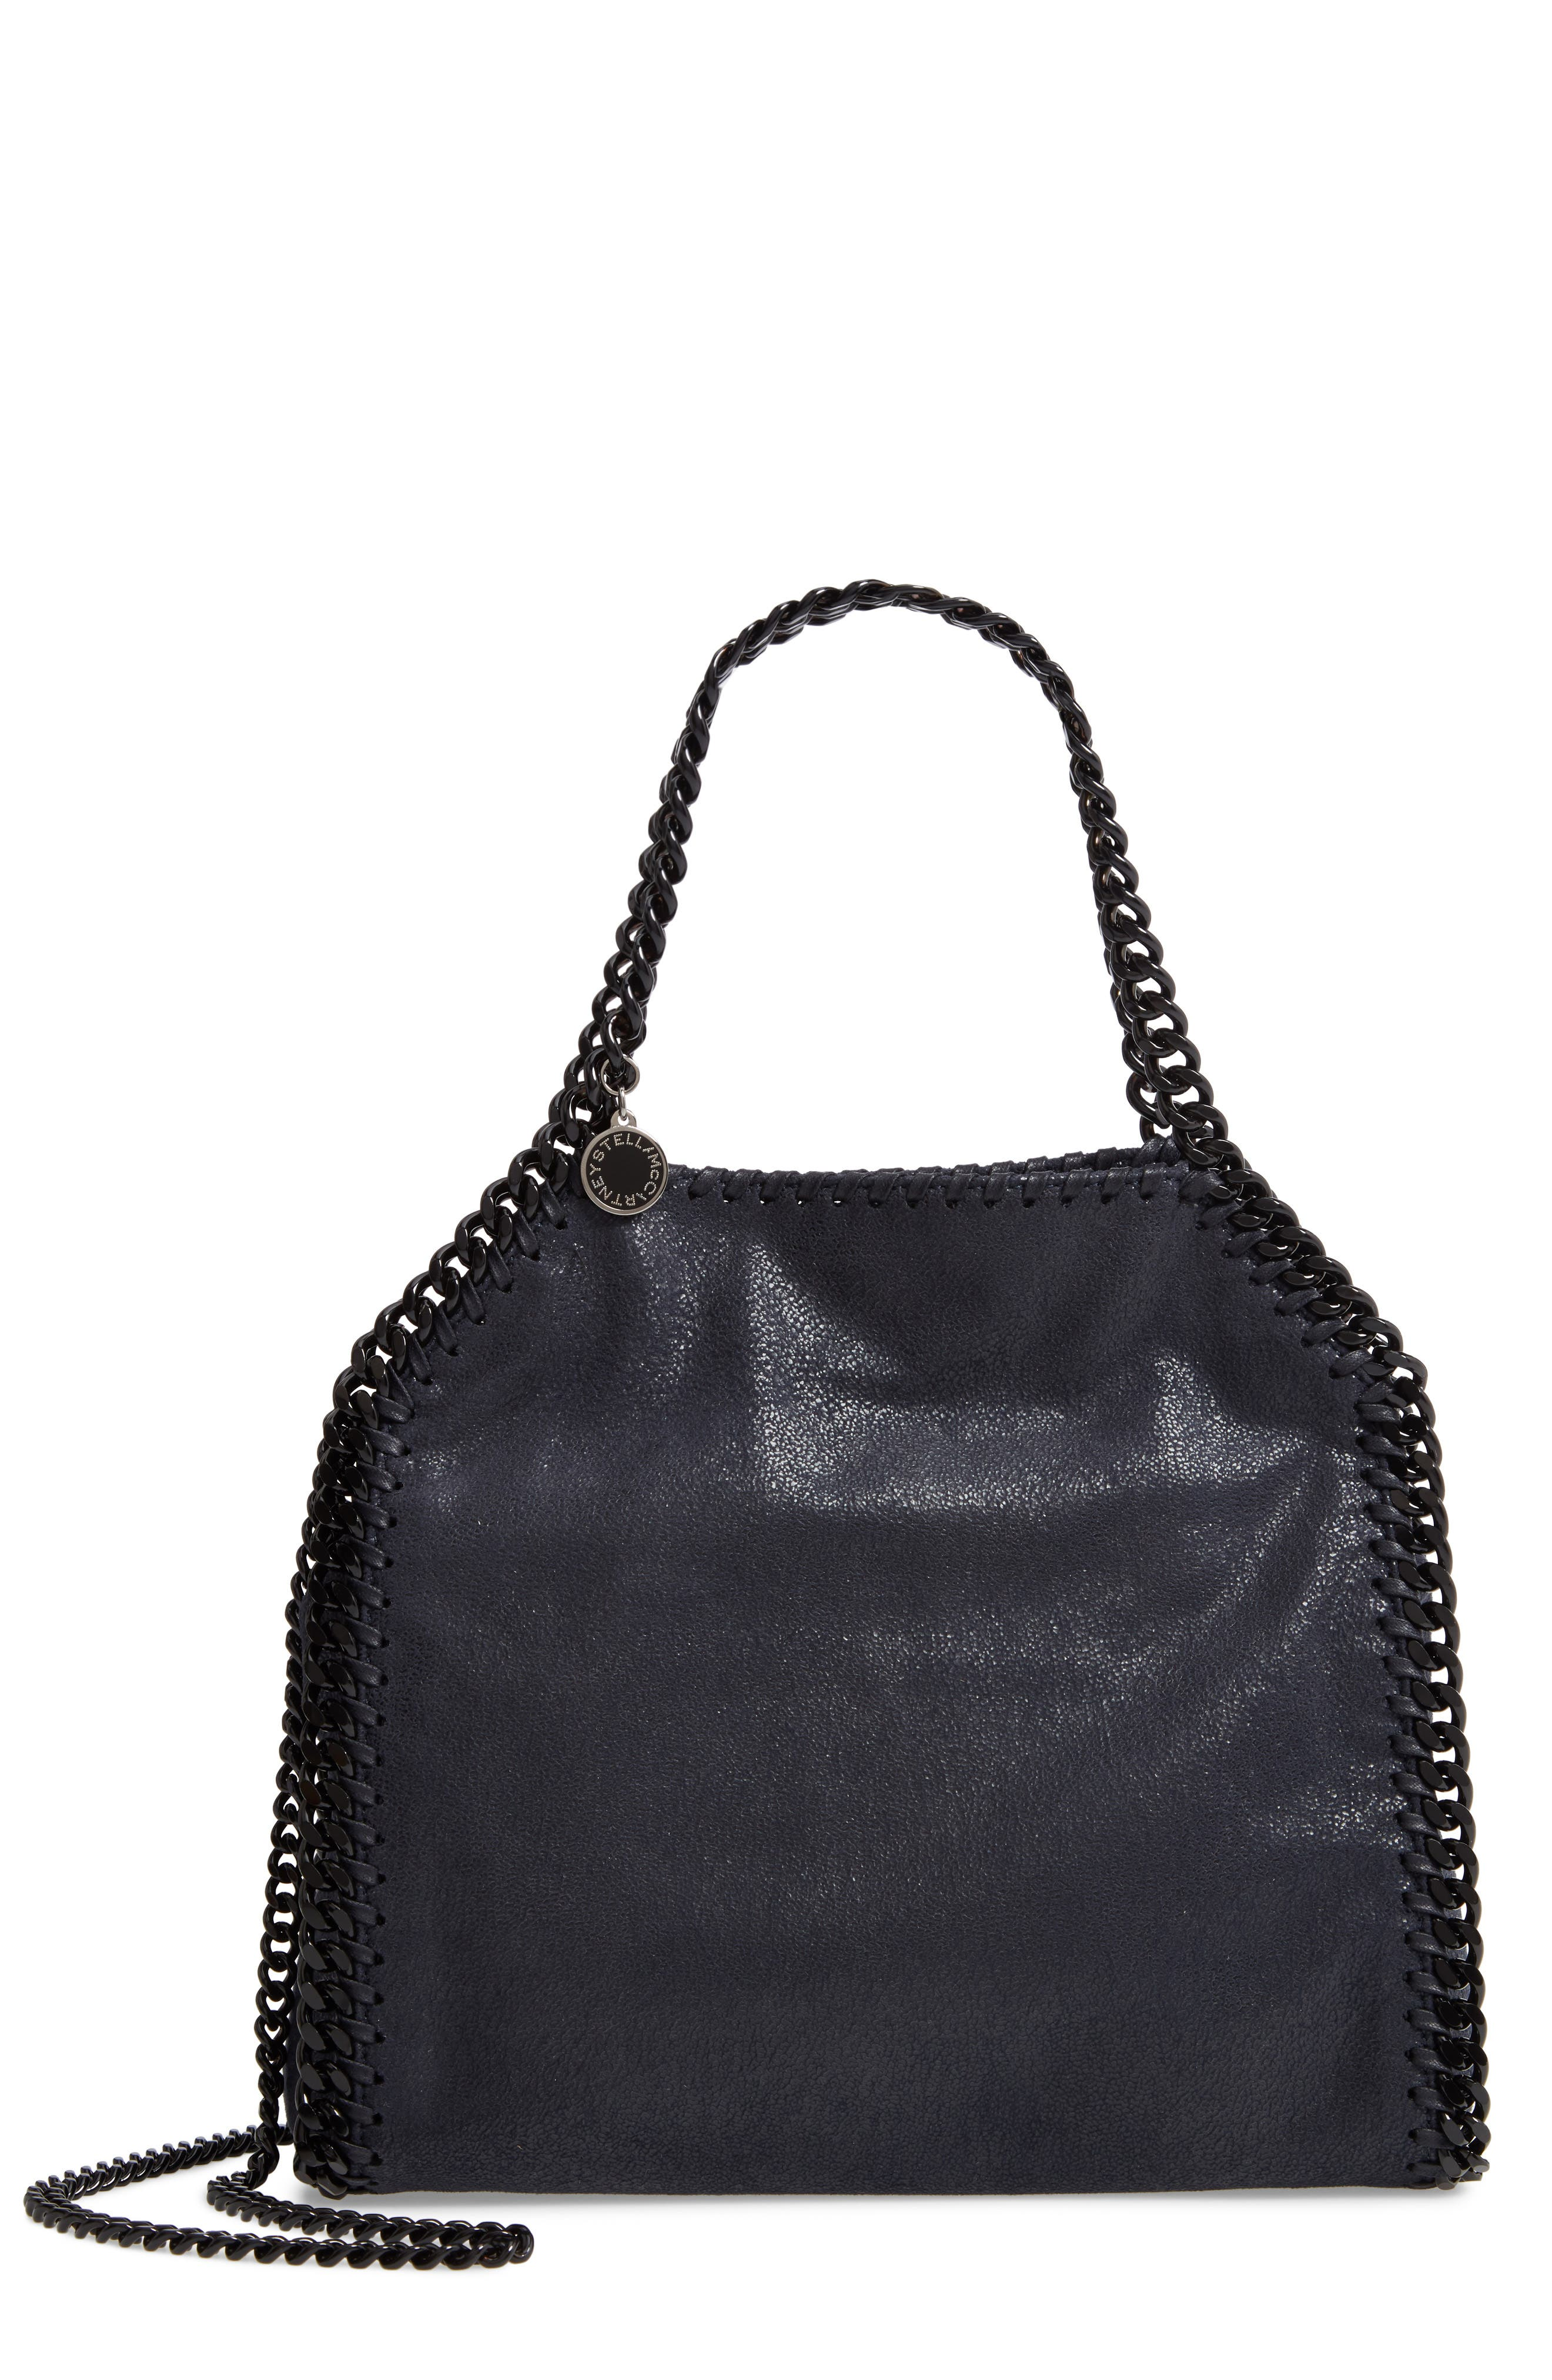 Stella McCartney Women s Handbags   Purses   Nordstrom 61b71ac7d0